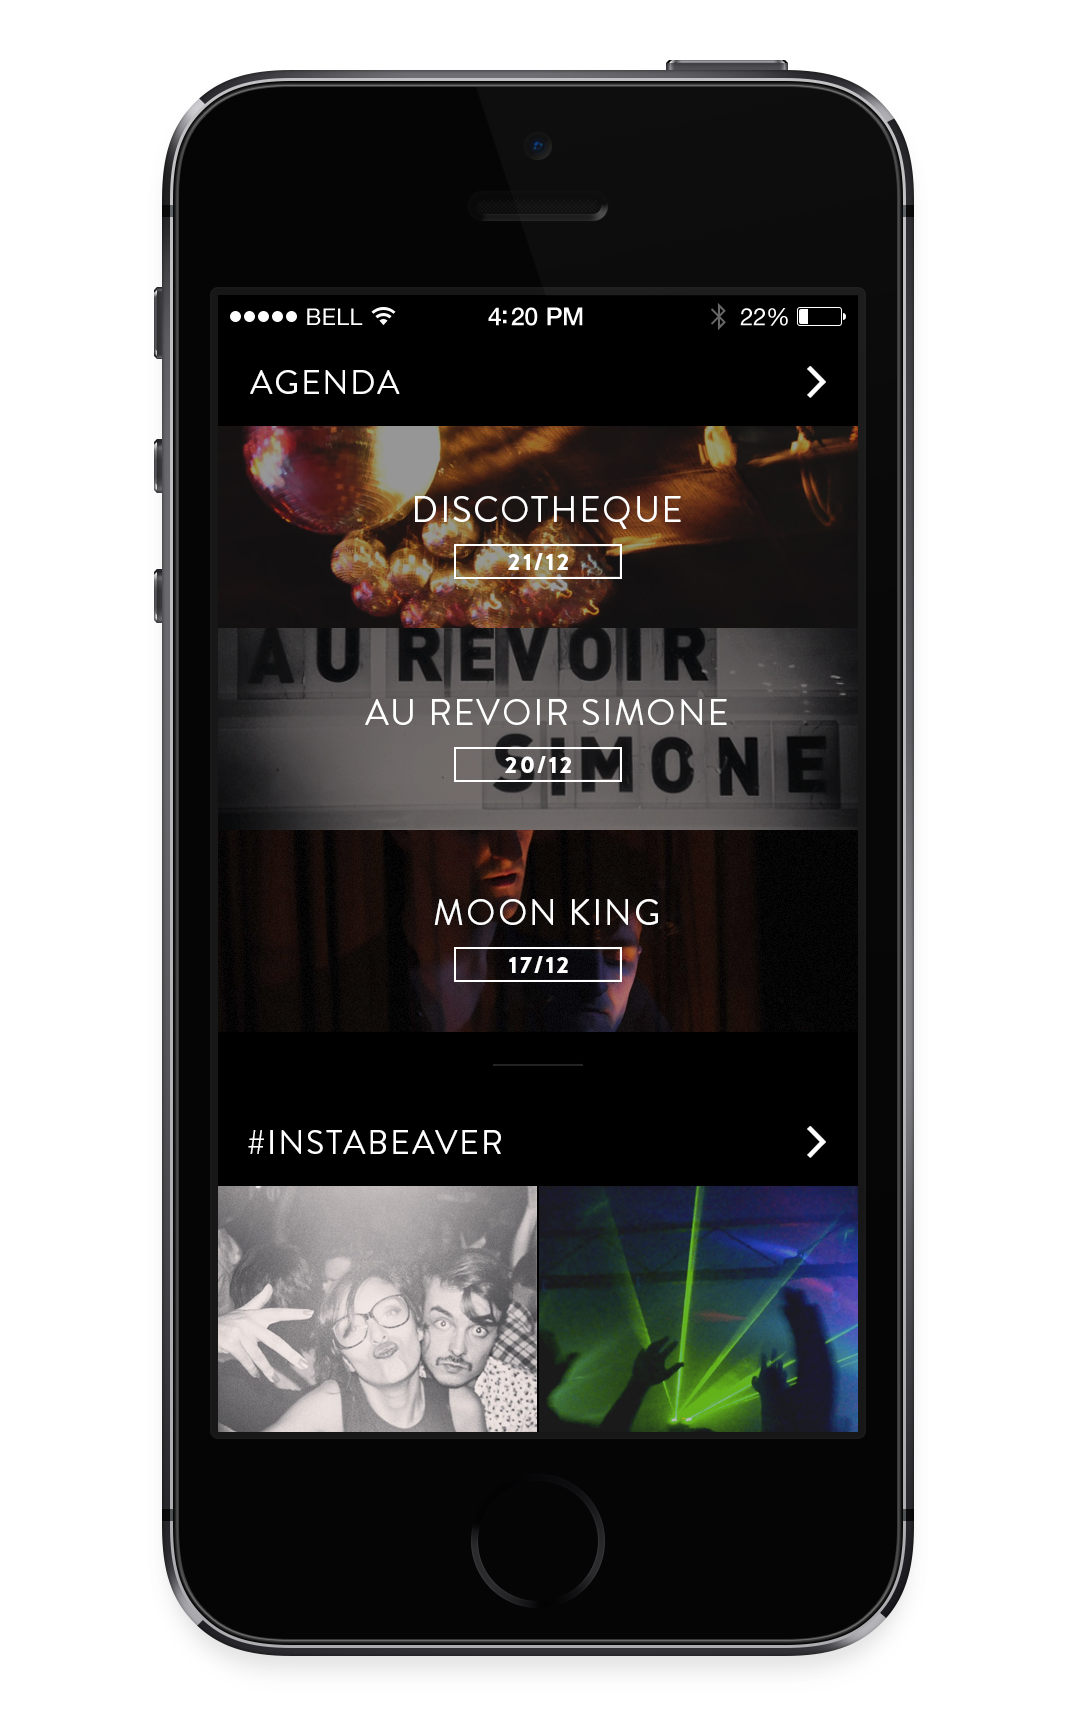 Adobe Portfolio,mobexclusive,UI,ux,app,apple,mobile,service,bars,Entertainment,social network